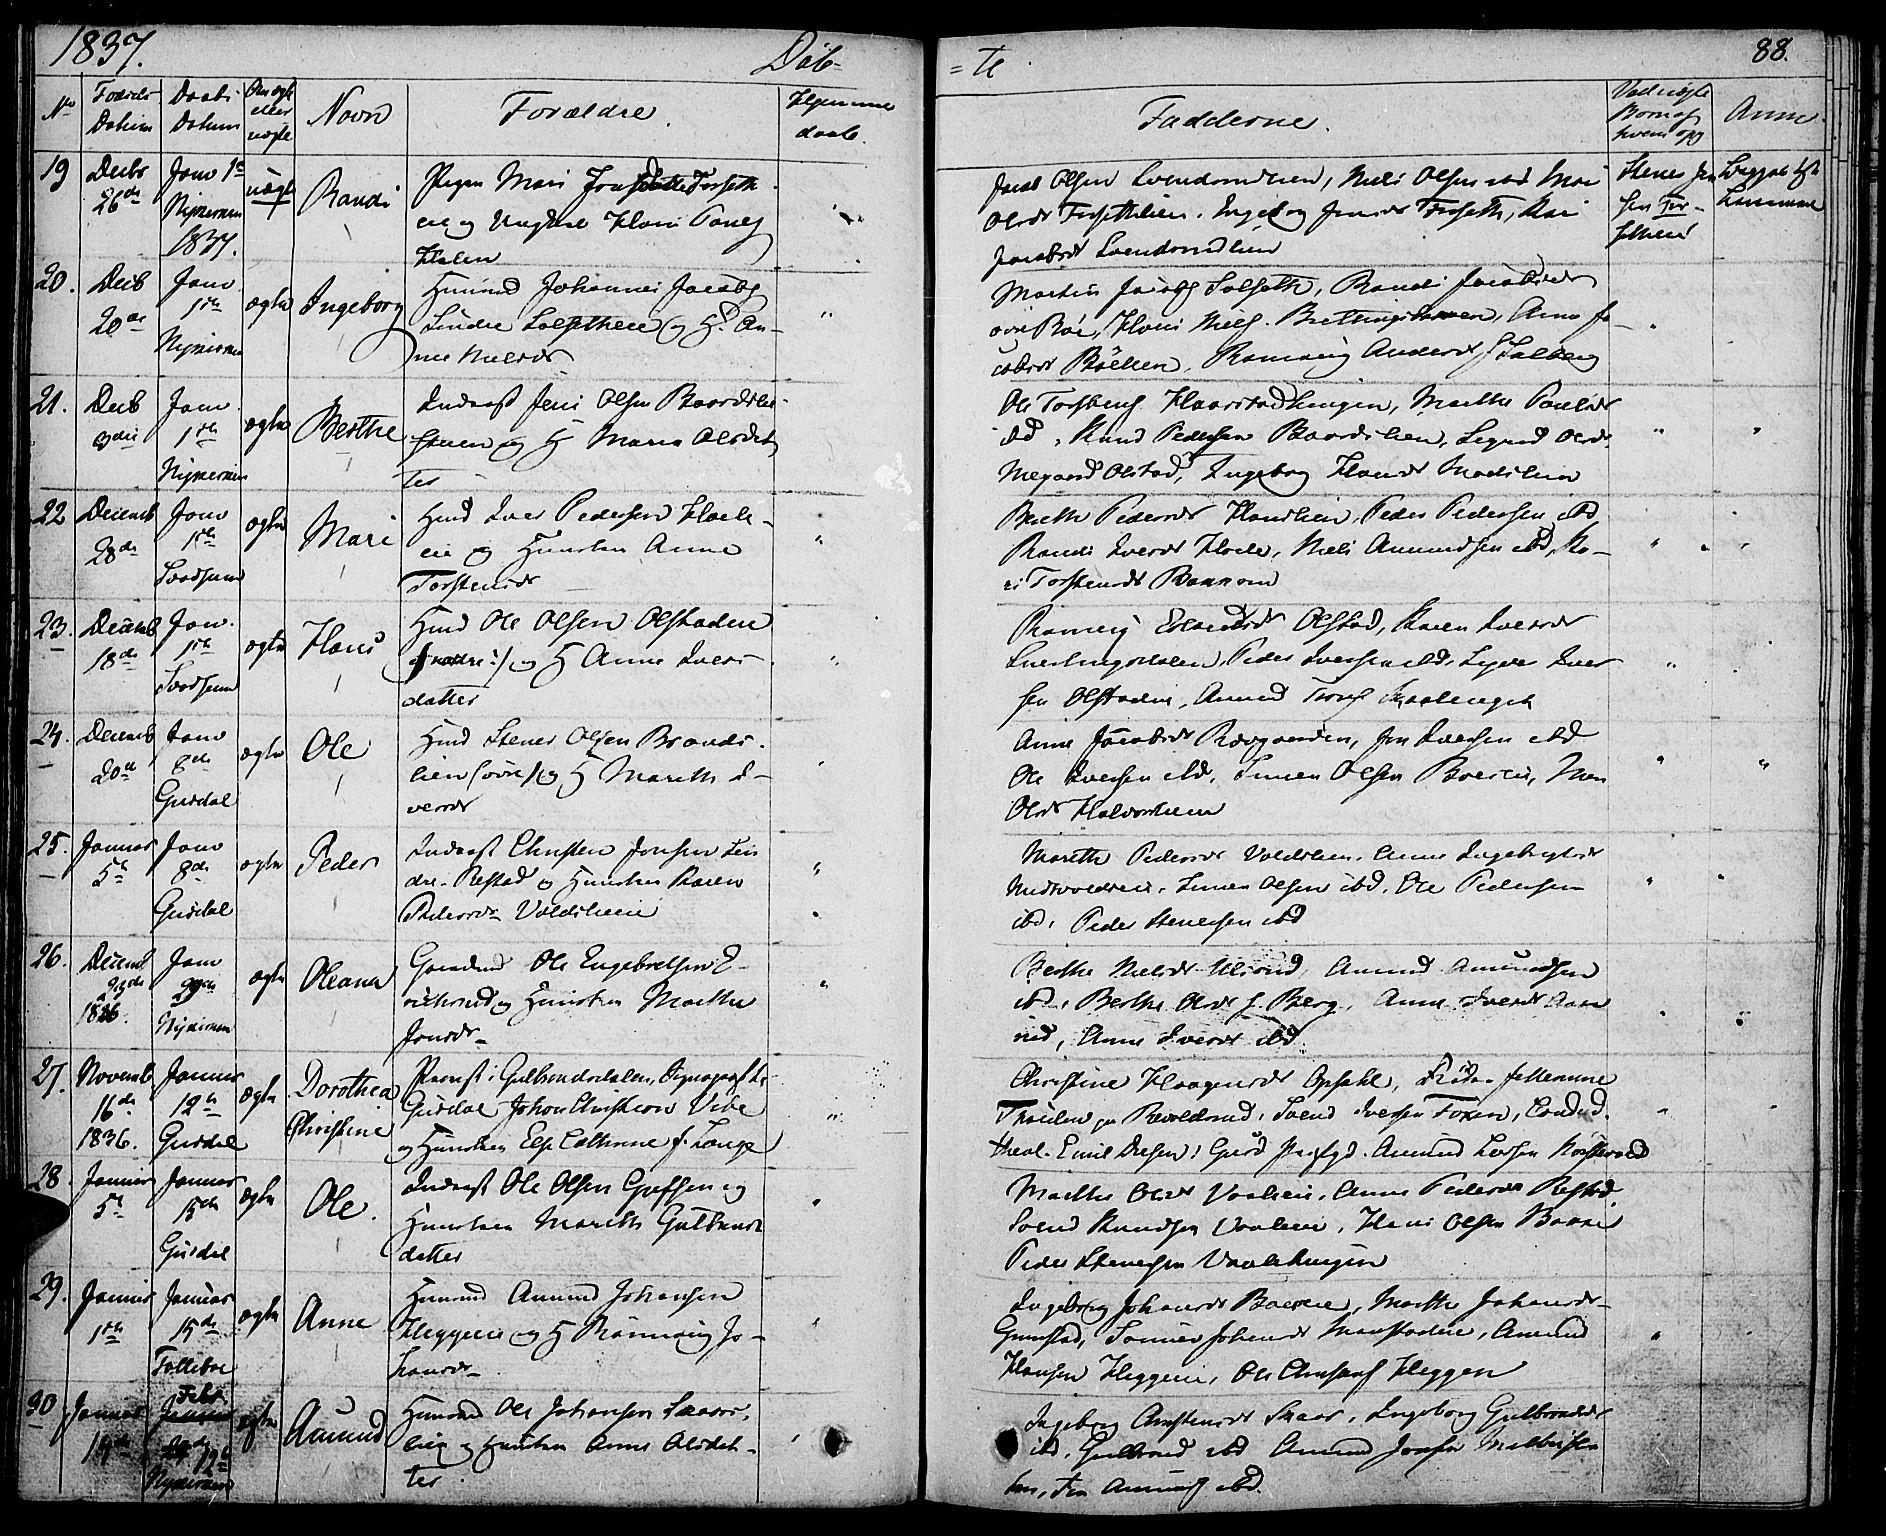 SAH, Gausdal prestekontor, Ministerialbok nr. 6, 1830-1839, s. 88